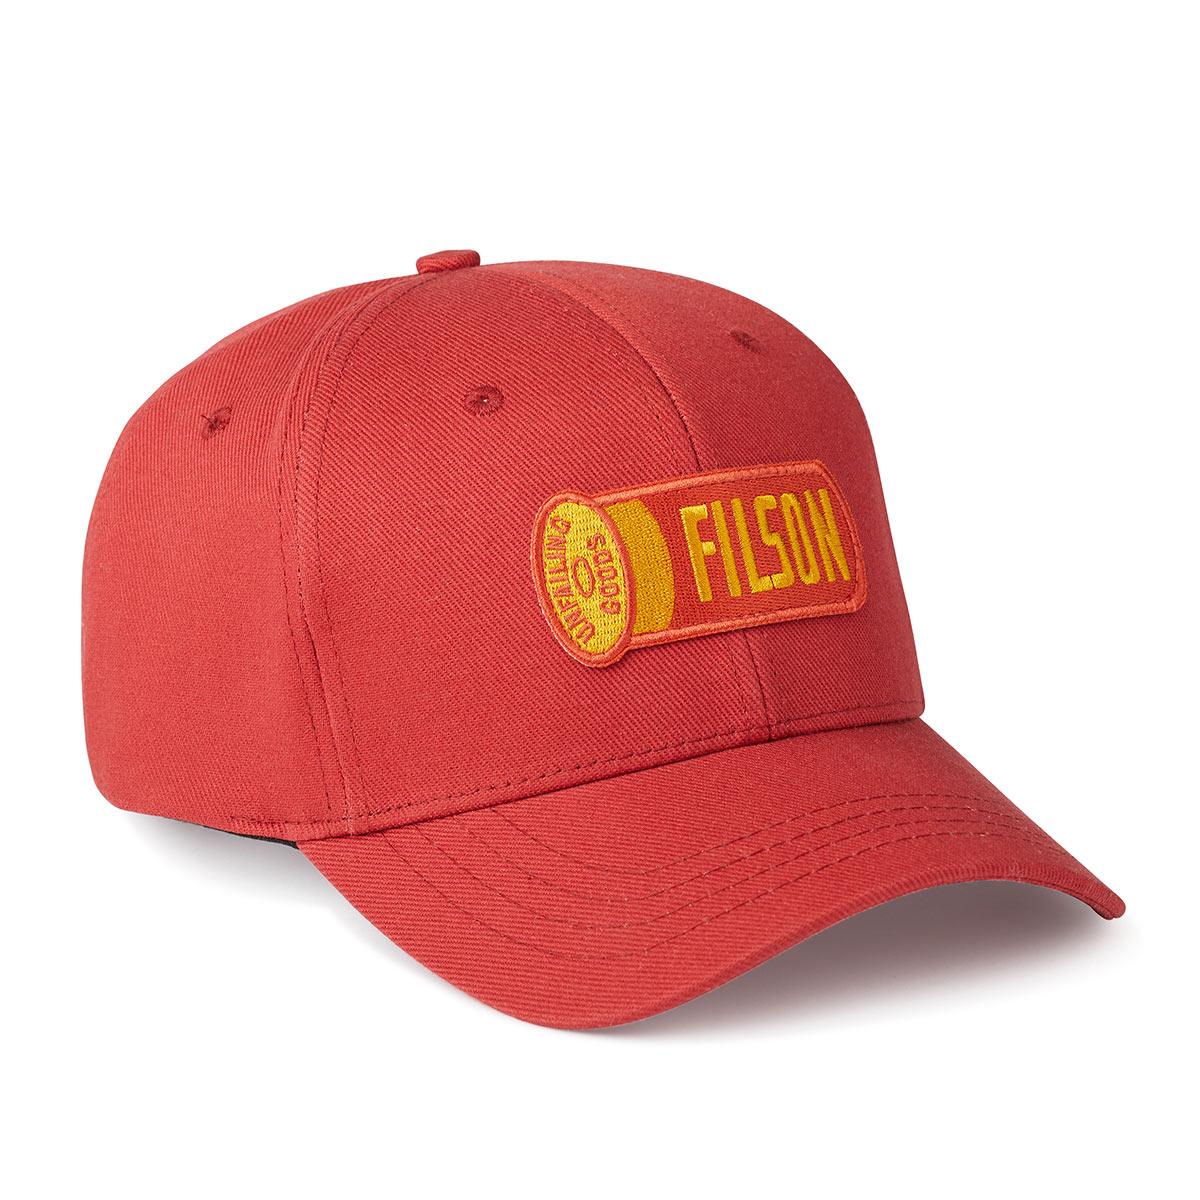 Filson Logger Cap Cardinal Red